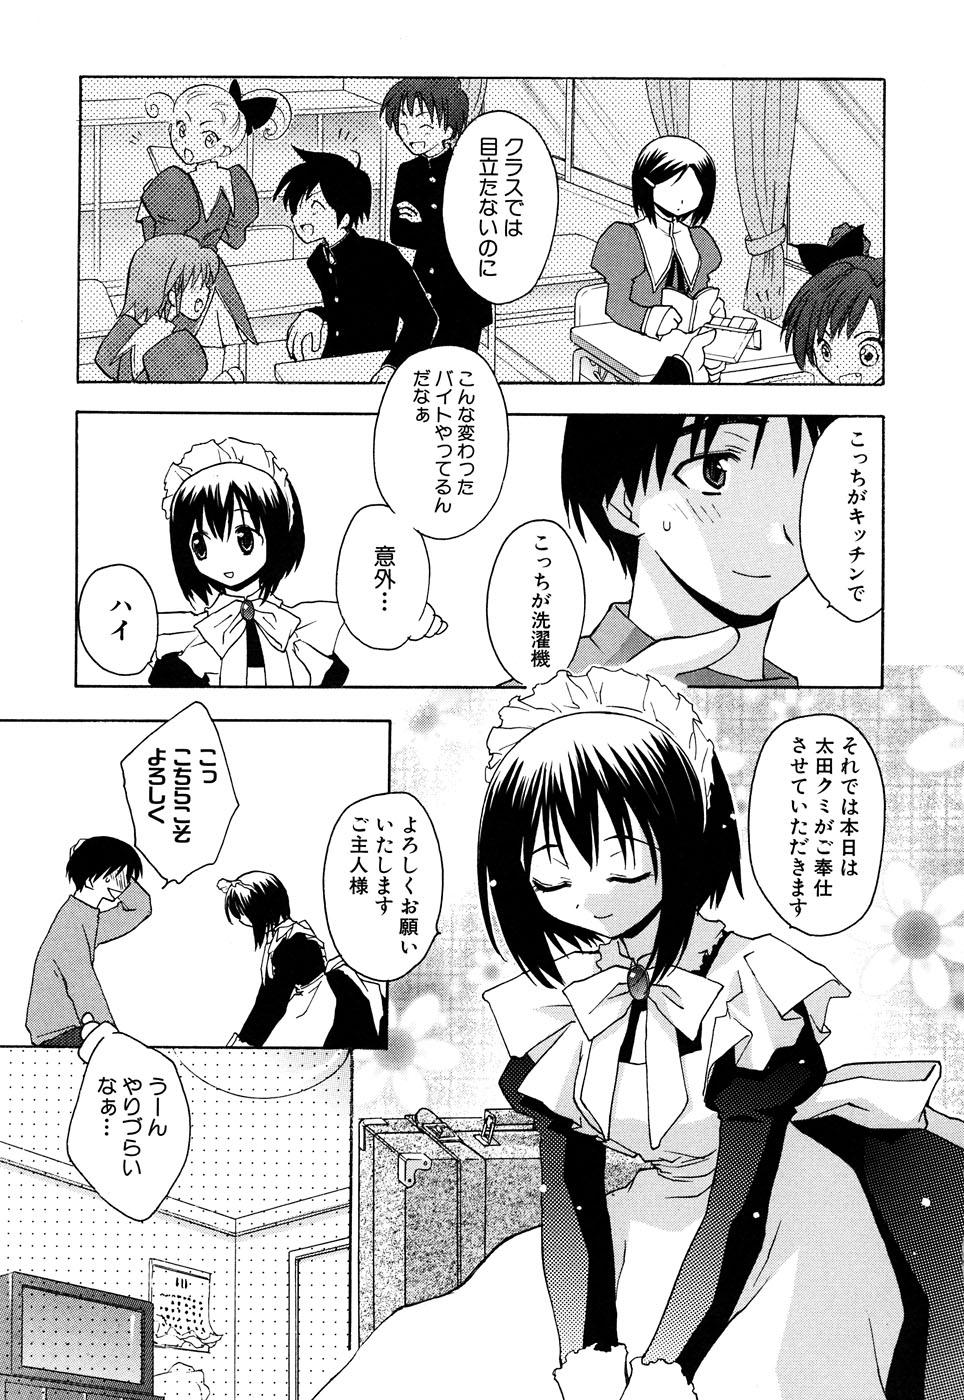 Fechikko VS Series ROUND.2 Miko San VS Maid San 89